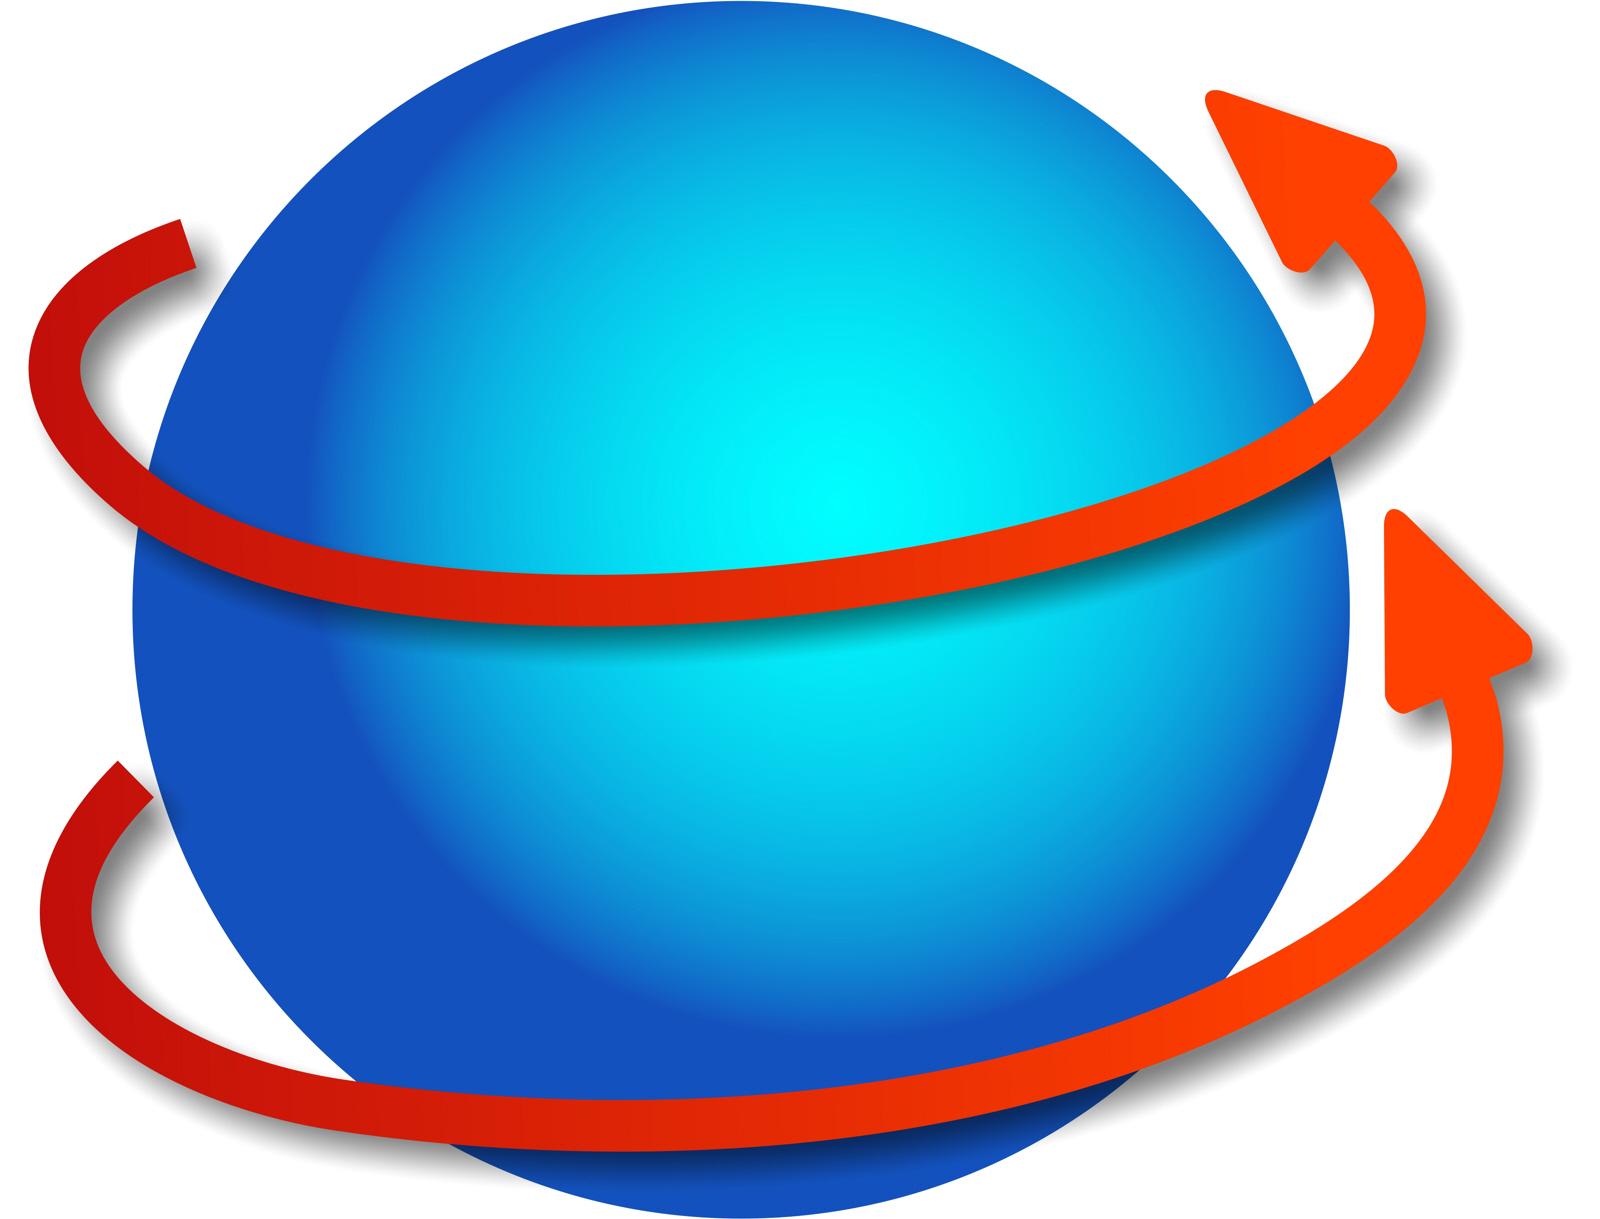 Free Stock Photo 9279 revolving globe | freeimageslive